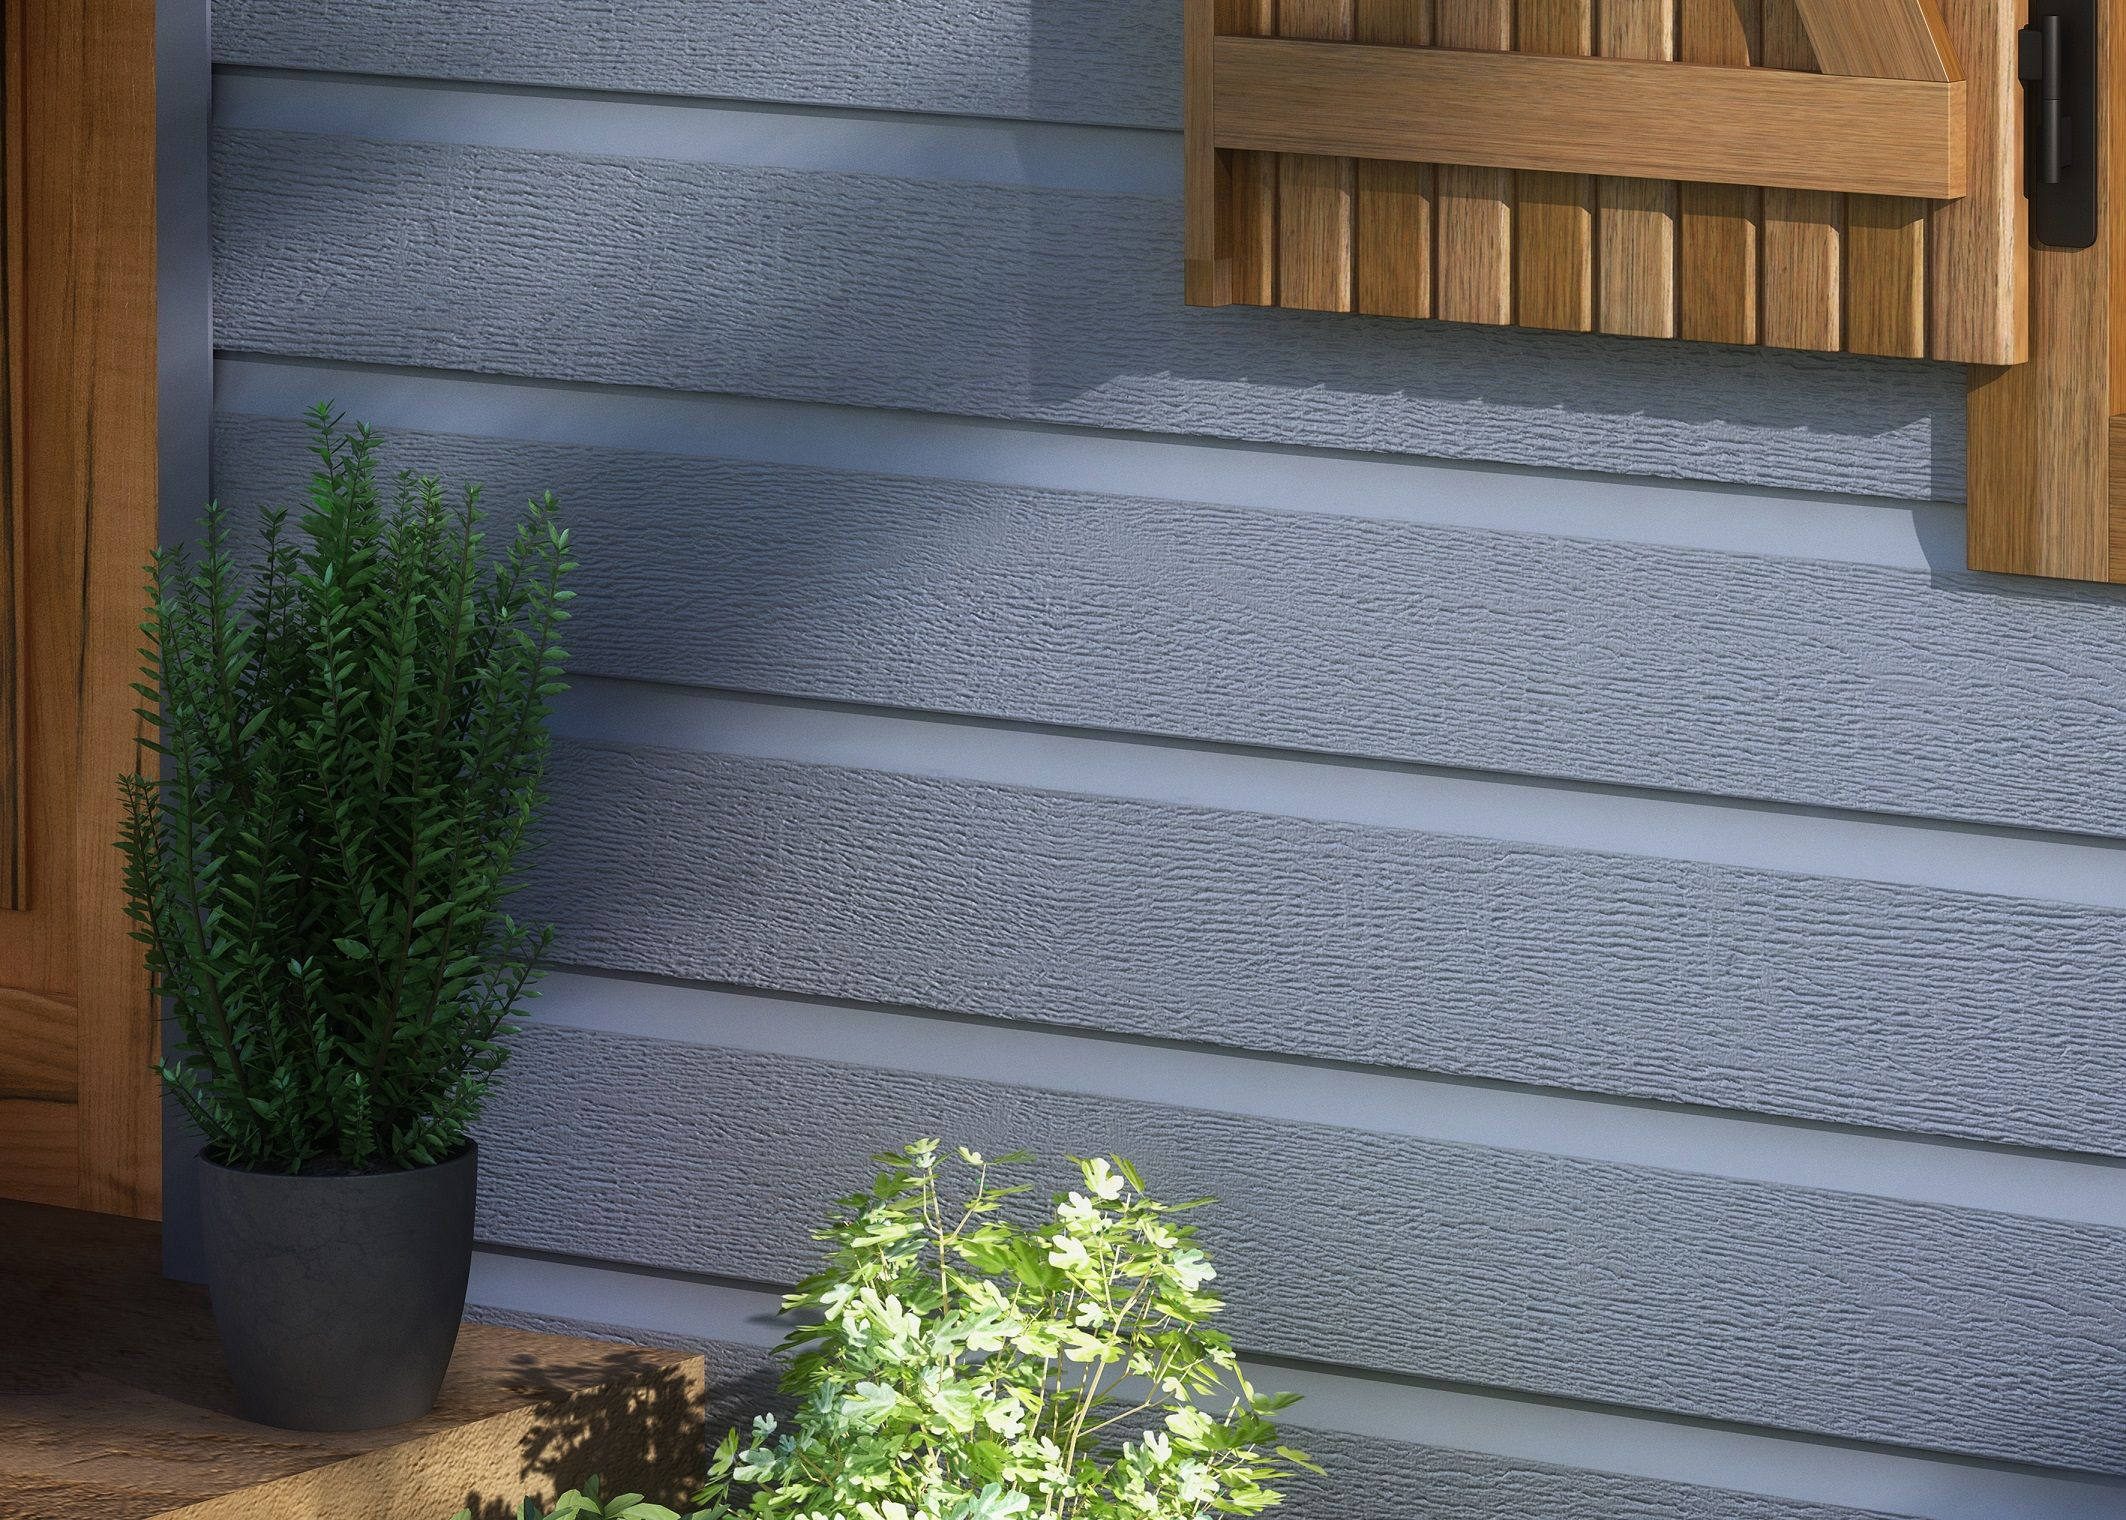 kerrafront fs 202 trex blue pokrycia elewacyjne facade panels pinterest. Black Bedroom Furniture Sets. Home Design Ideas